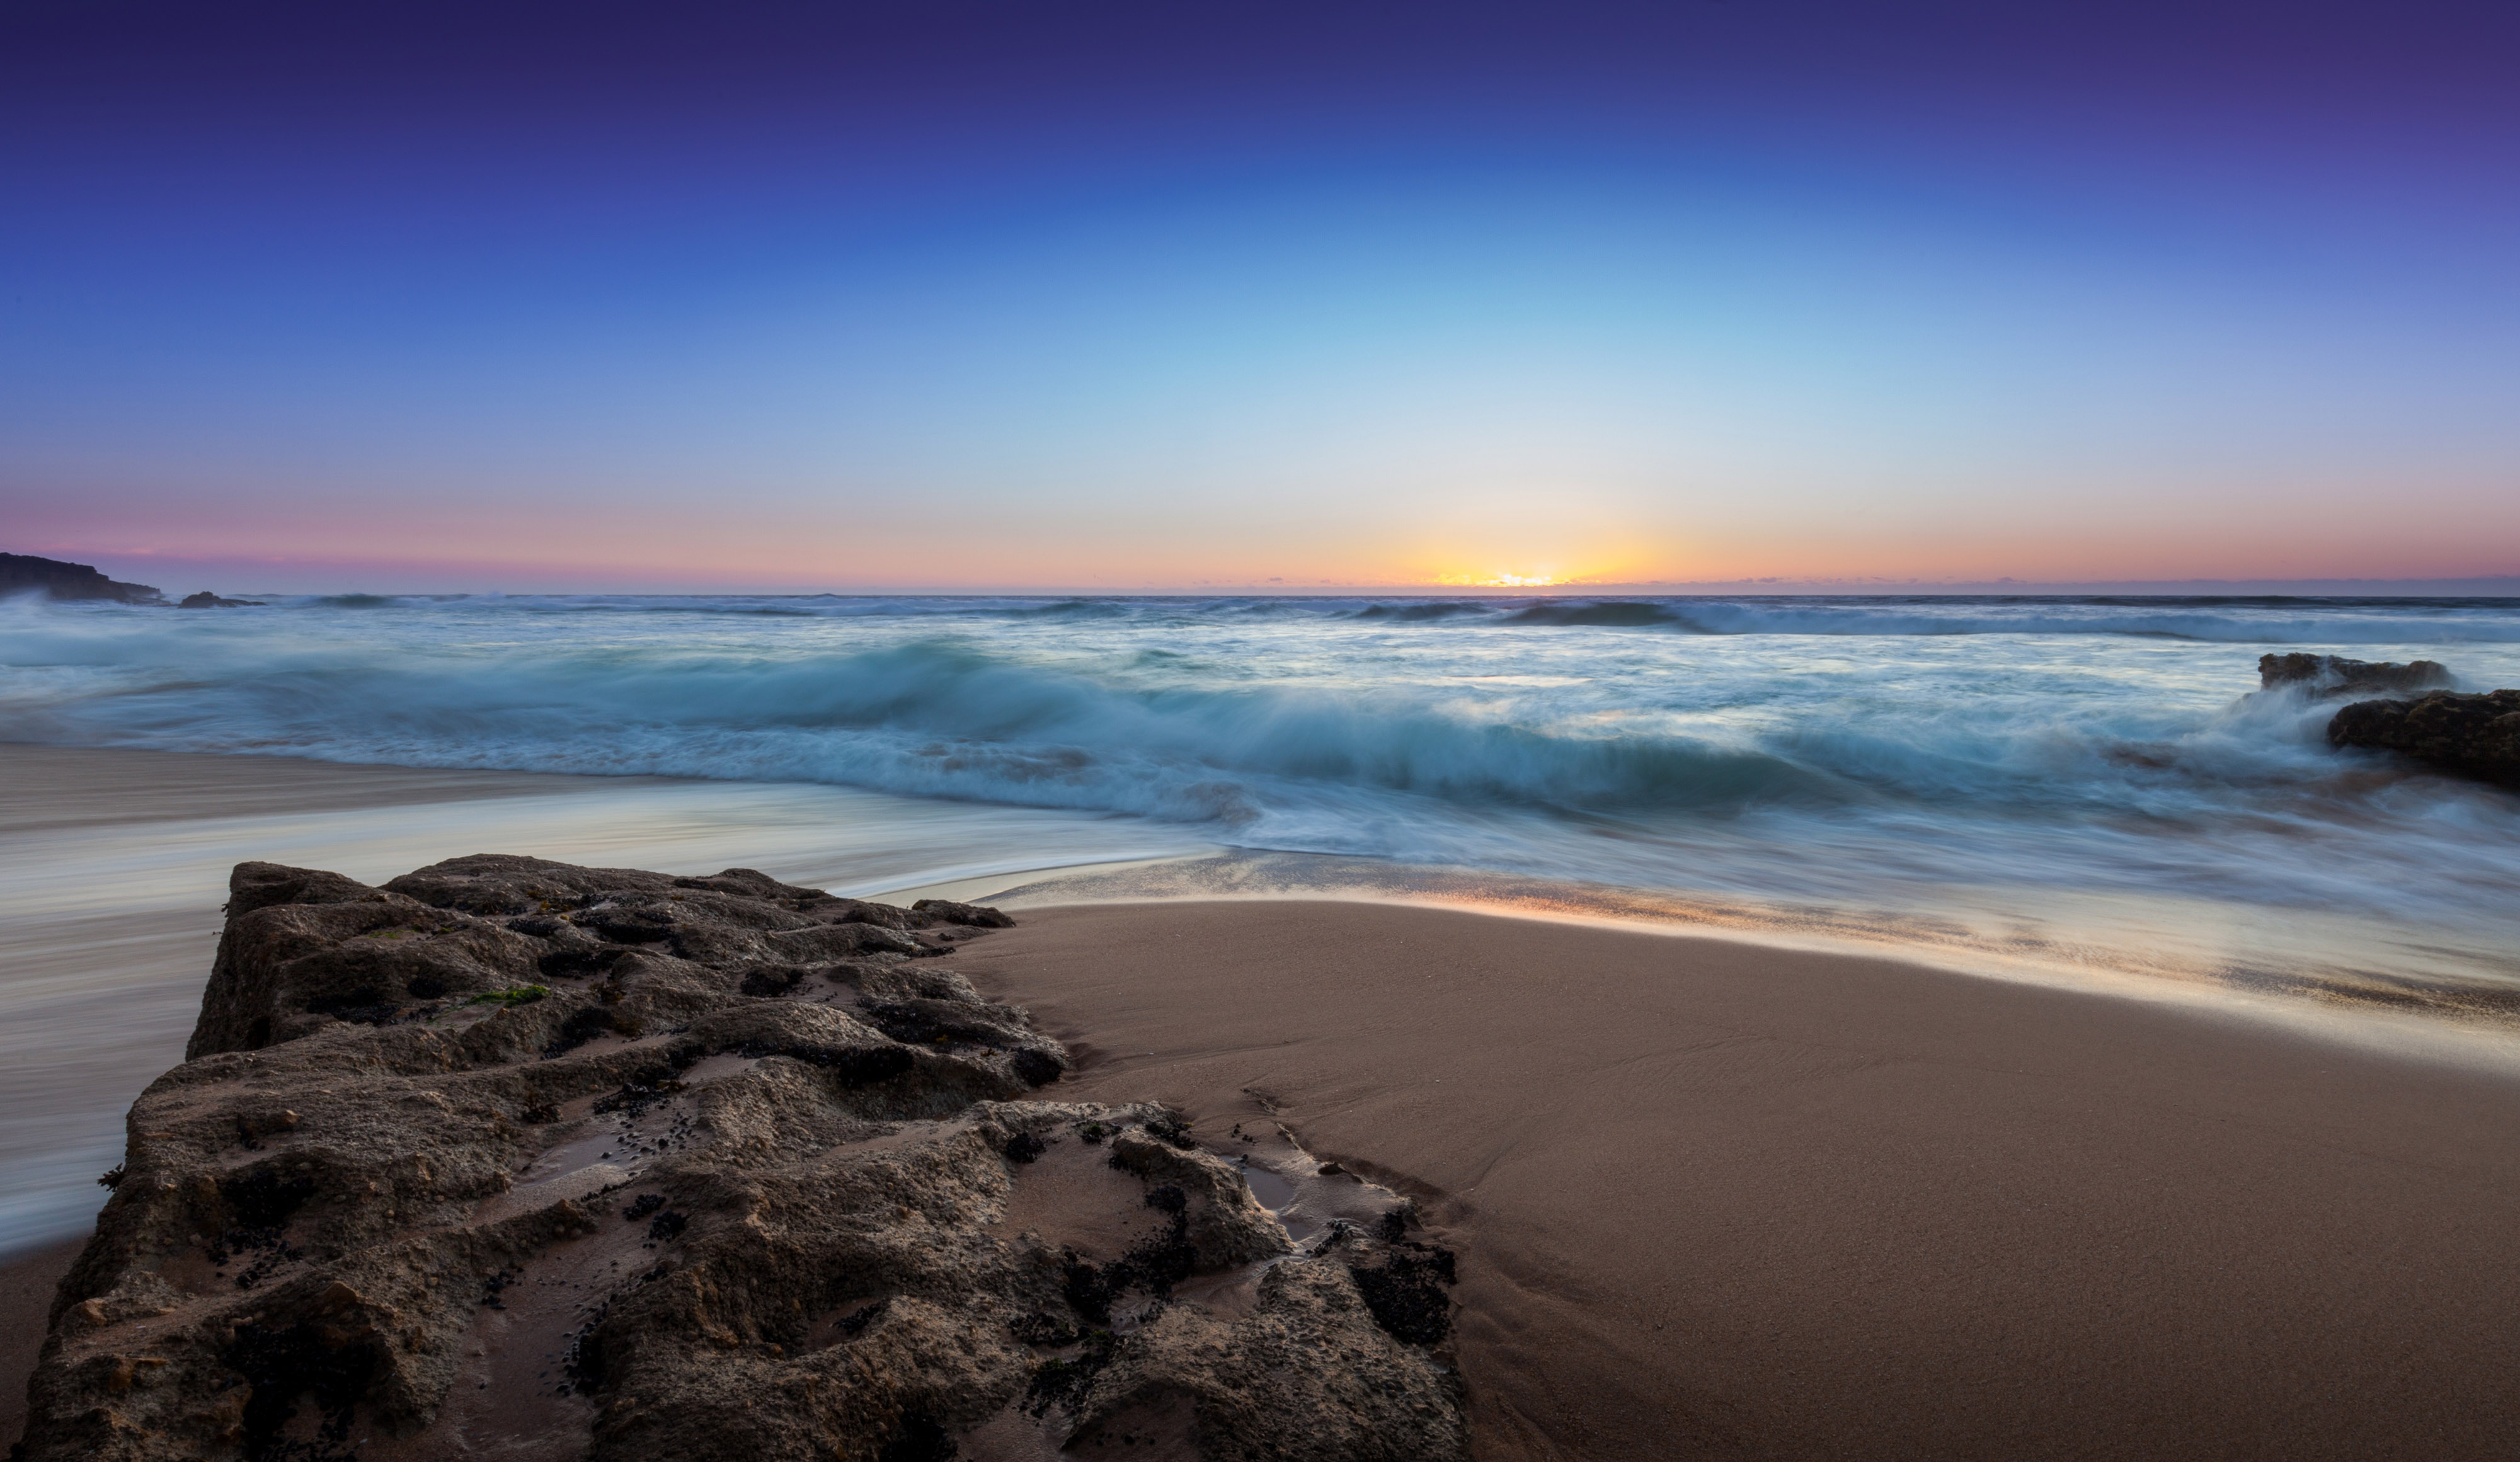 Praia do Guincho, Portugal - Manuel Inglez